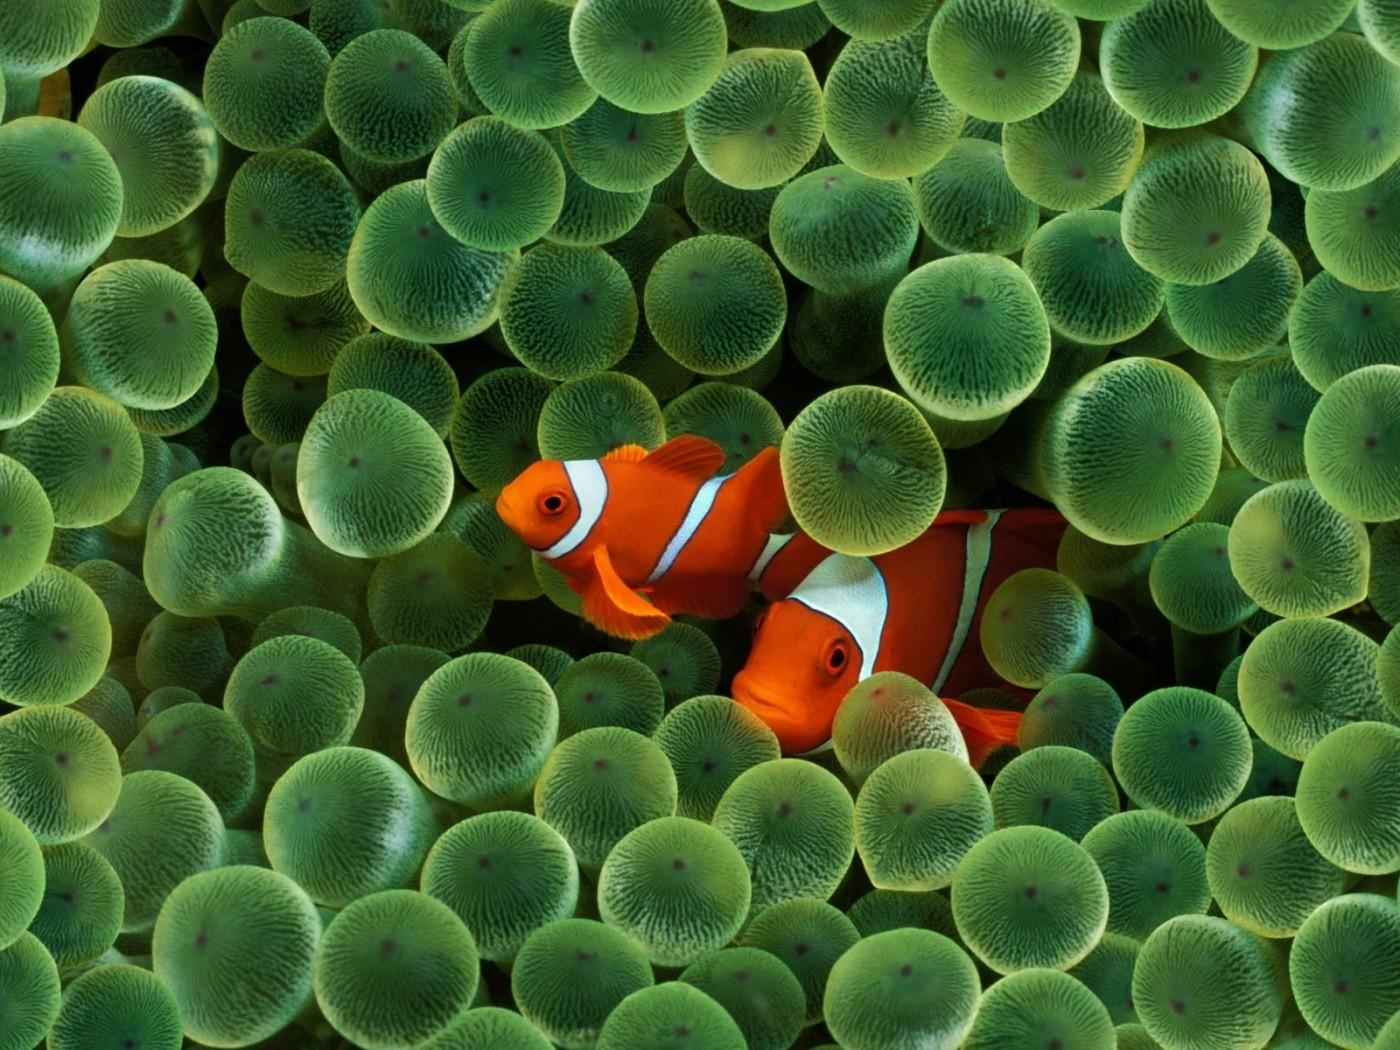 General 1400x1050 fish sea water animals clownfish sea anemones